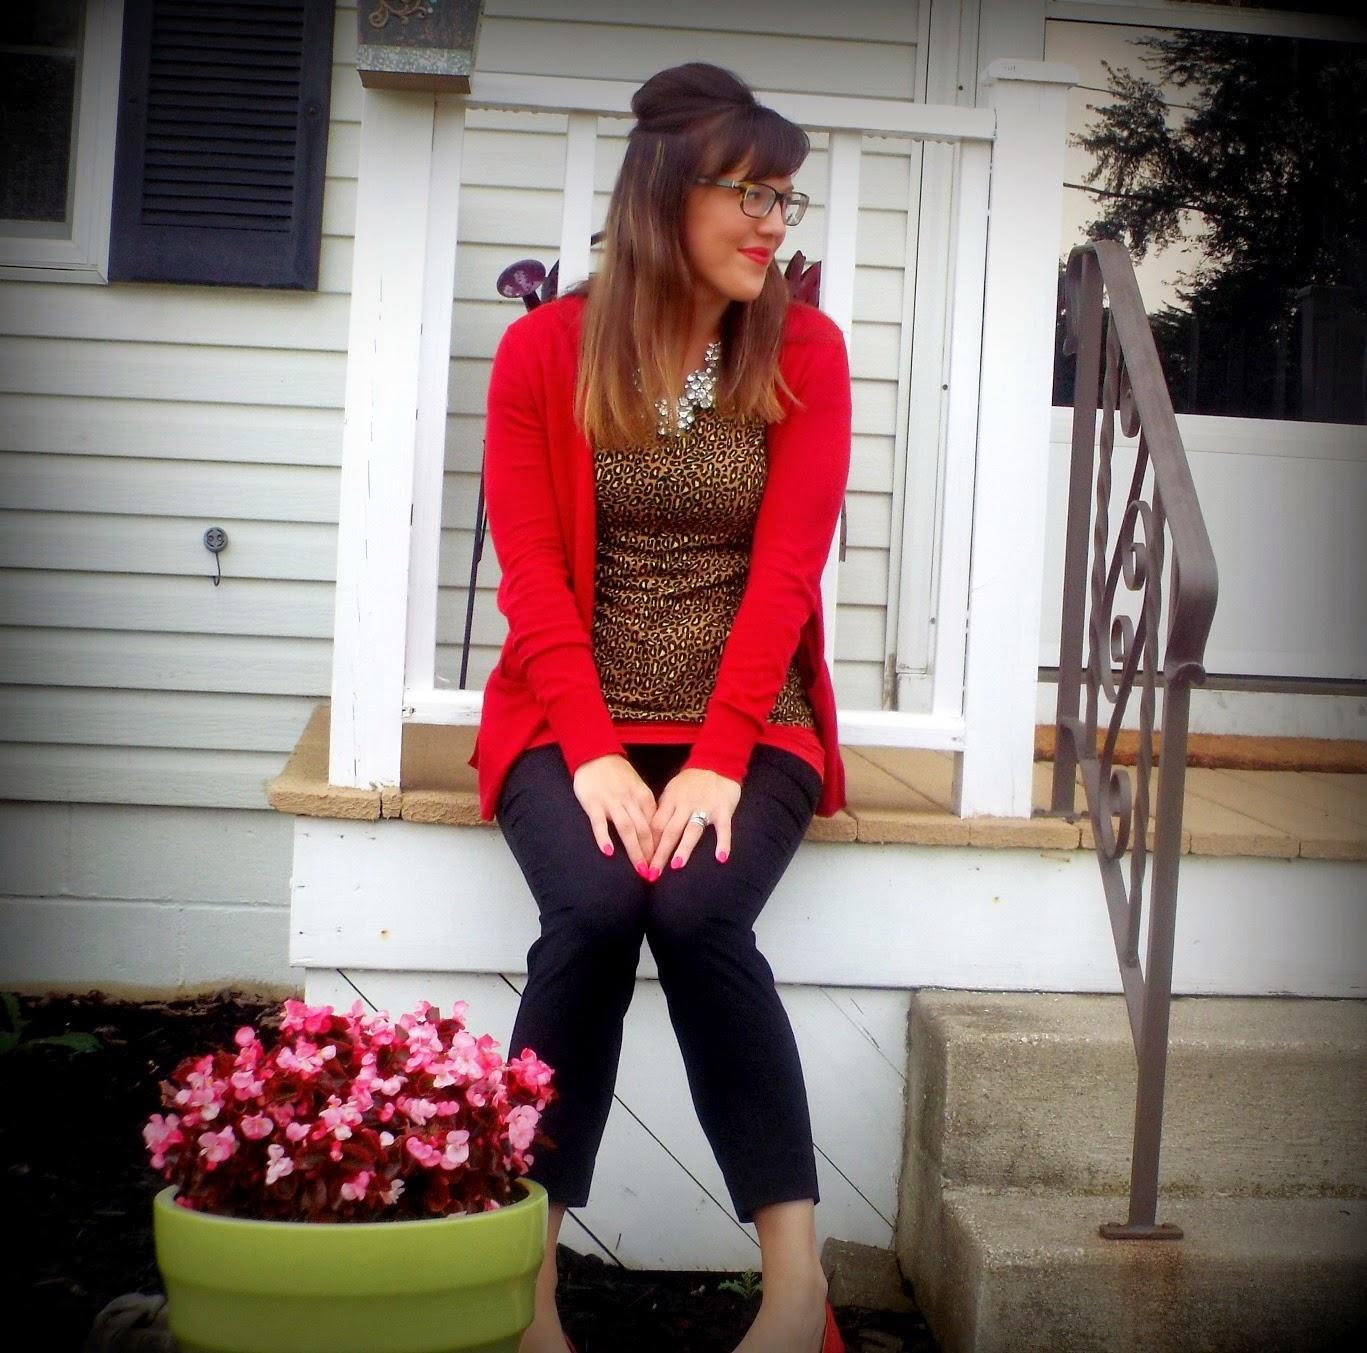 http://fashionblingandothergirlythings.blogspot.com/